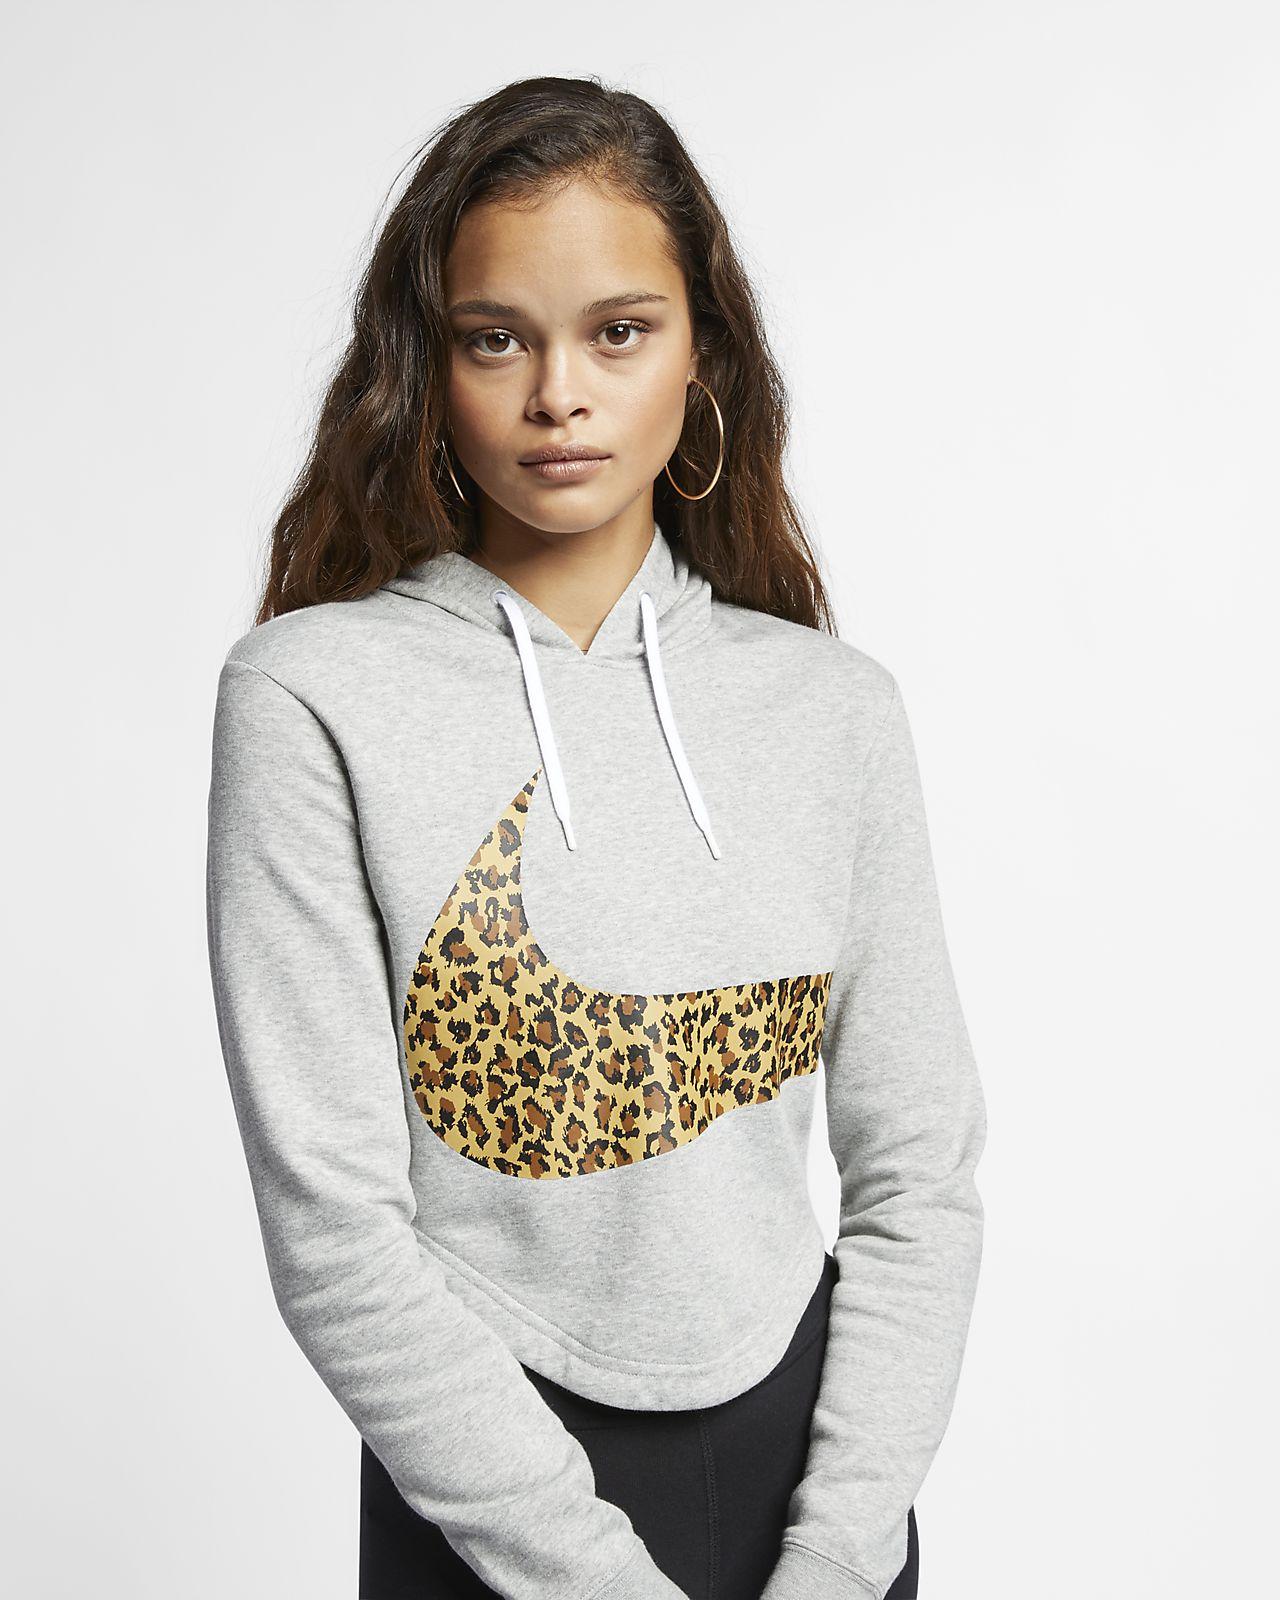 Nike Sportswear Dessuadora amb caputxa curta amb estampat d'animal - Dona